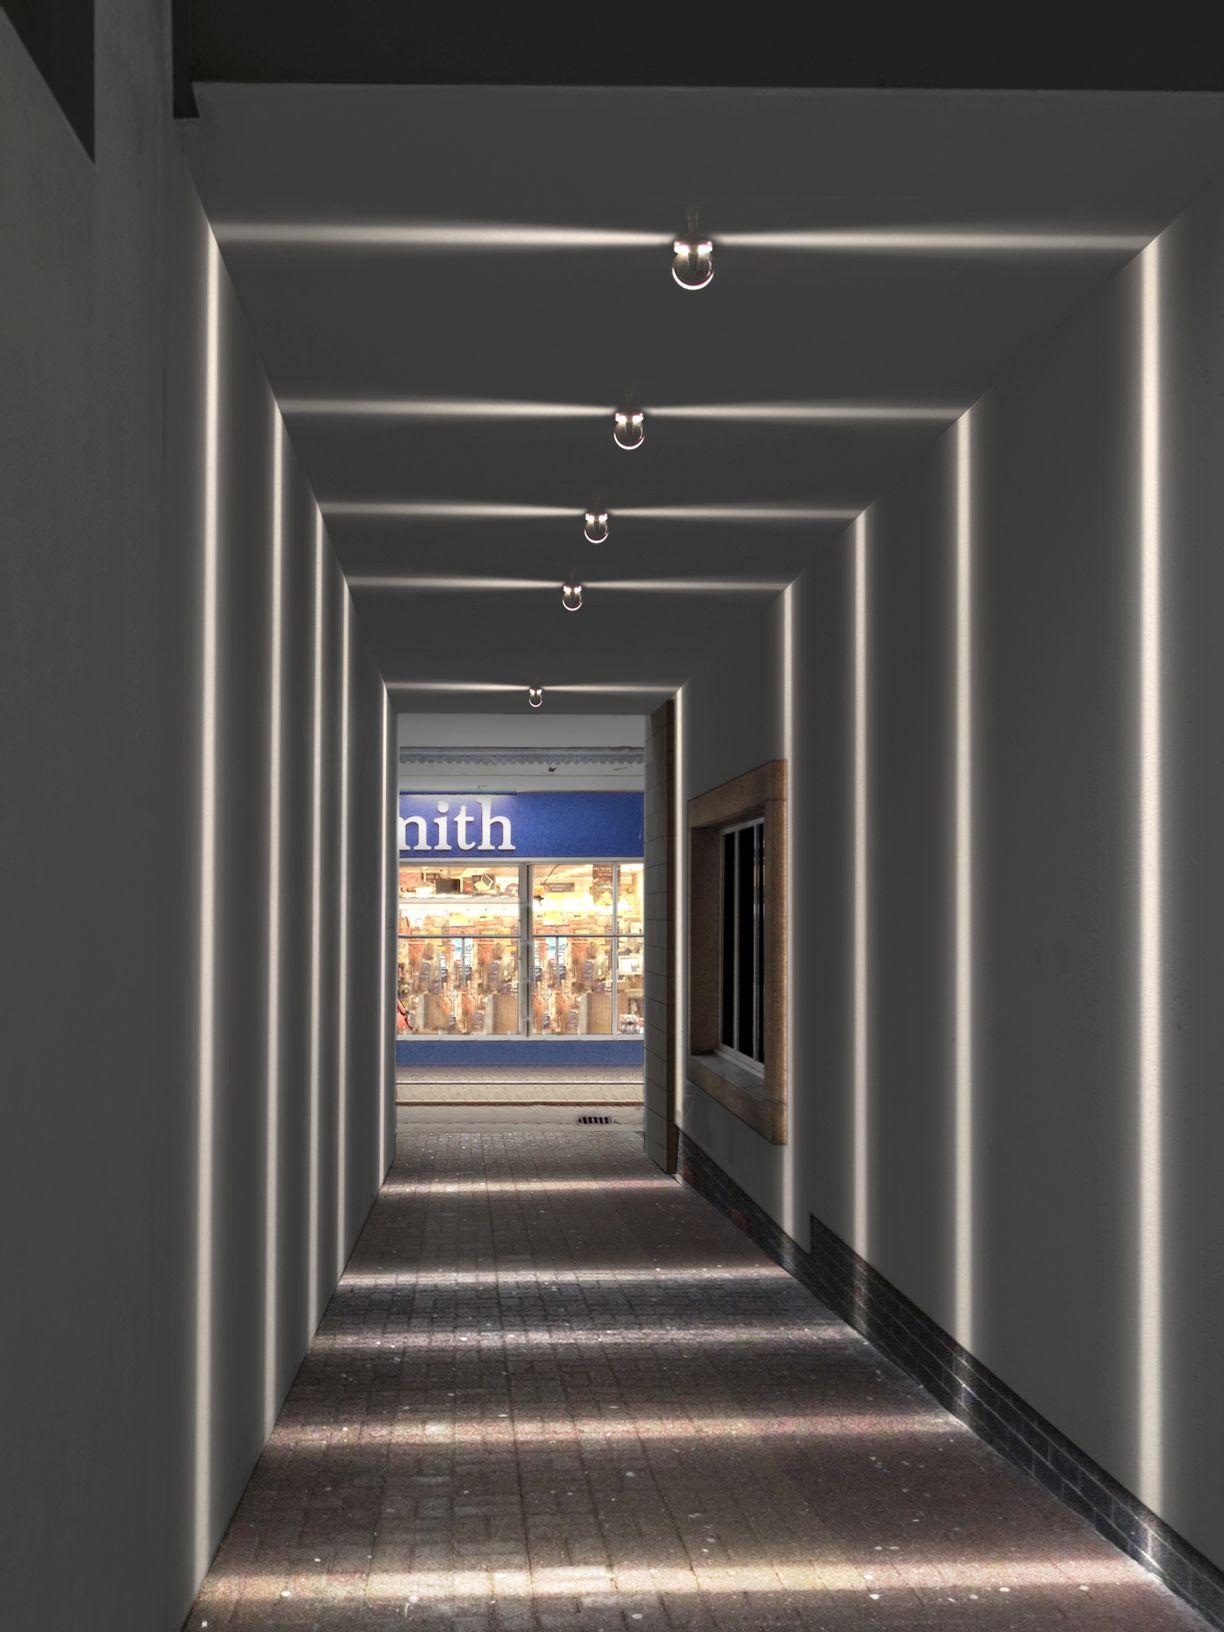 Dise o de design dean skira para iguzzini firma - Iluminacion exterior led ...